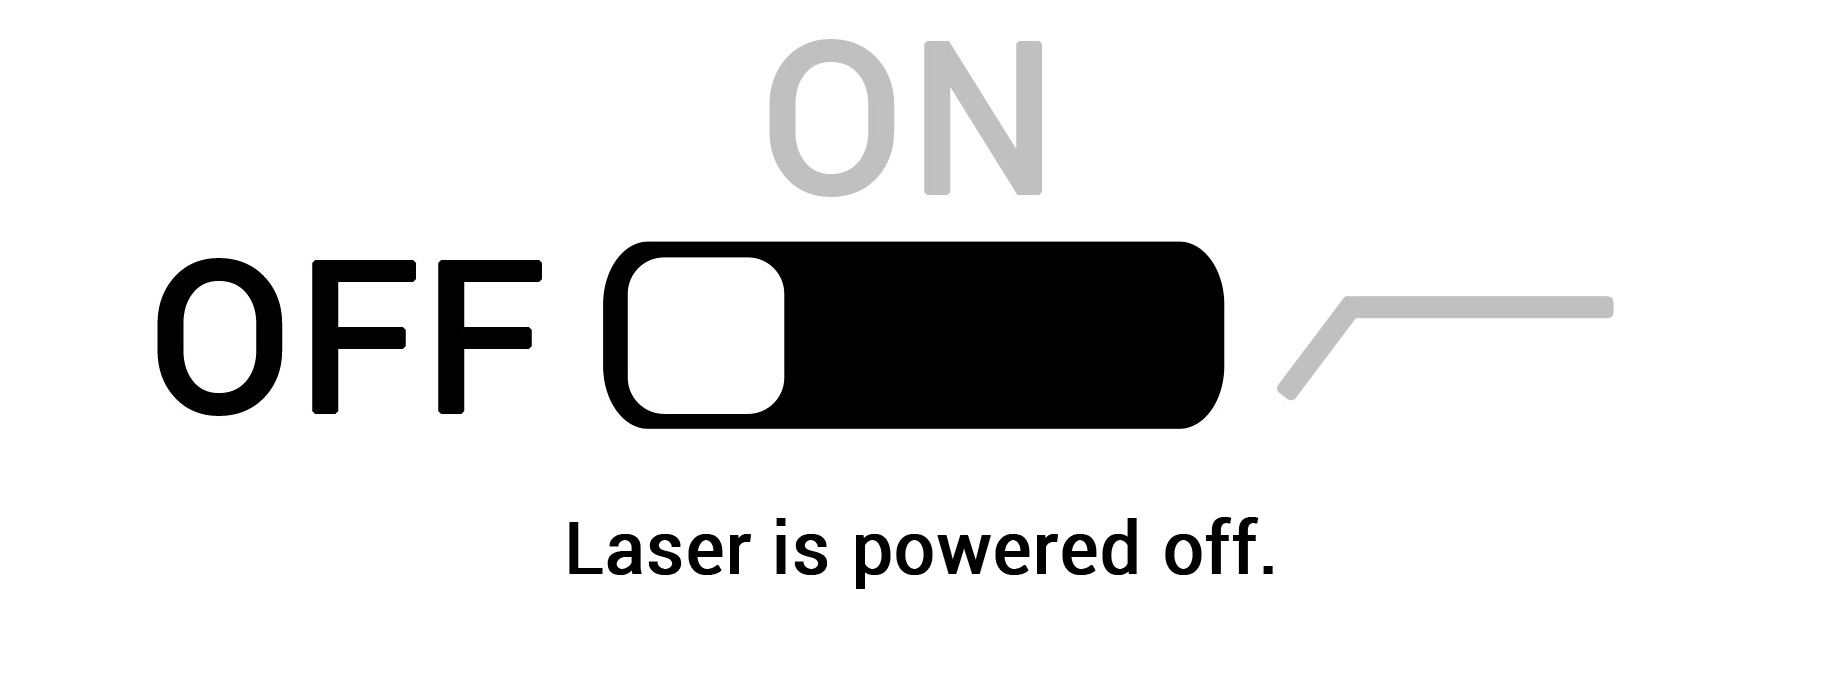 laser-switch-off.jpg